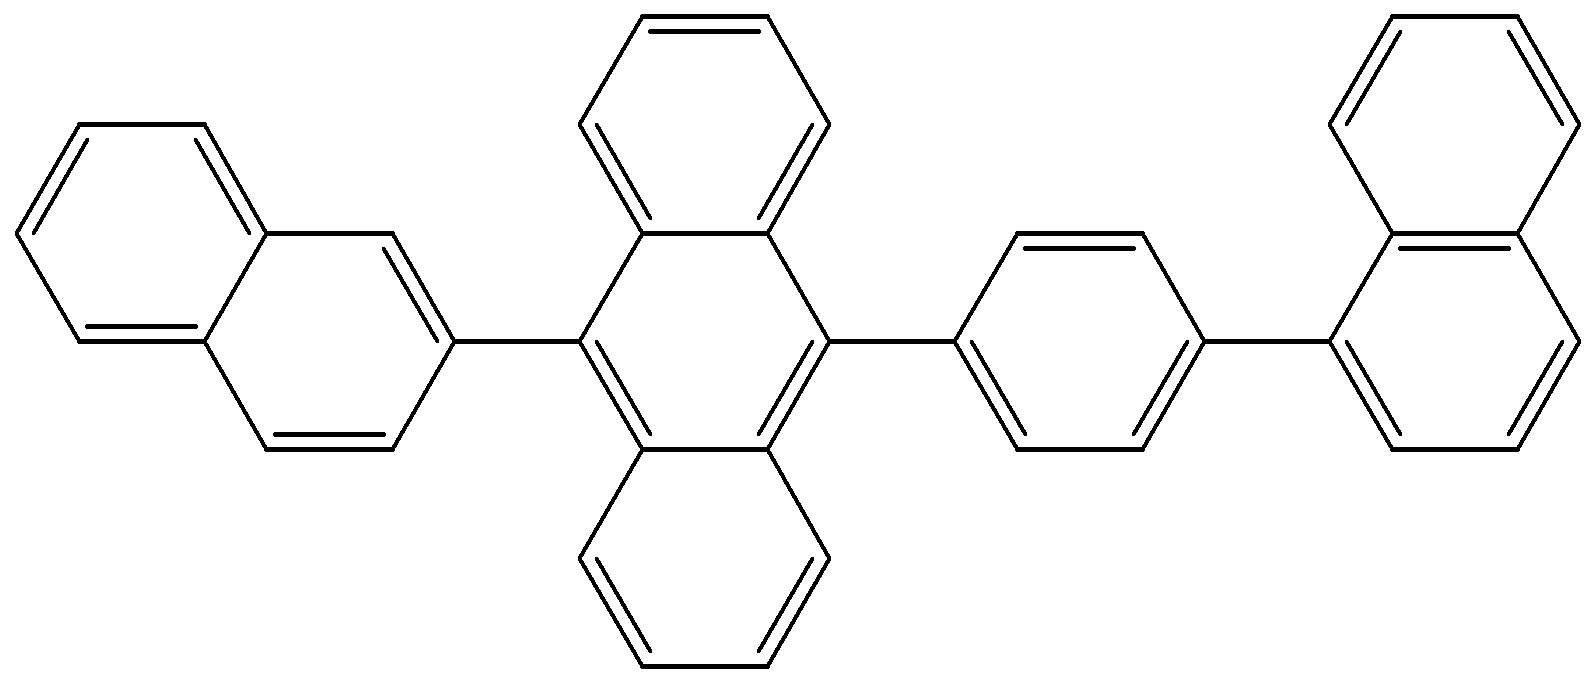 Figure 112005017102381-pat00002